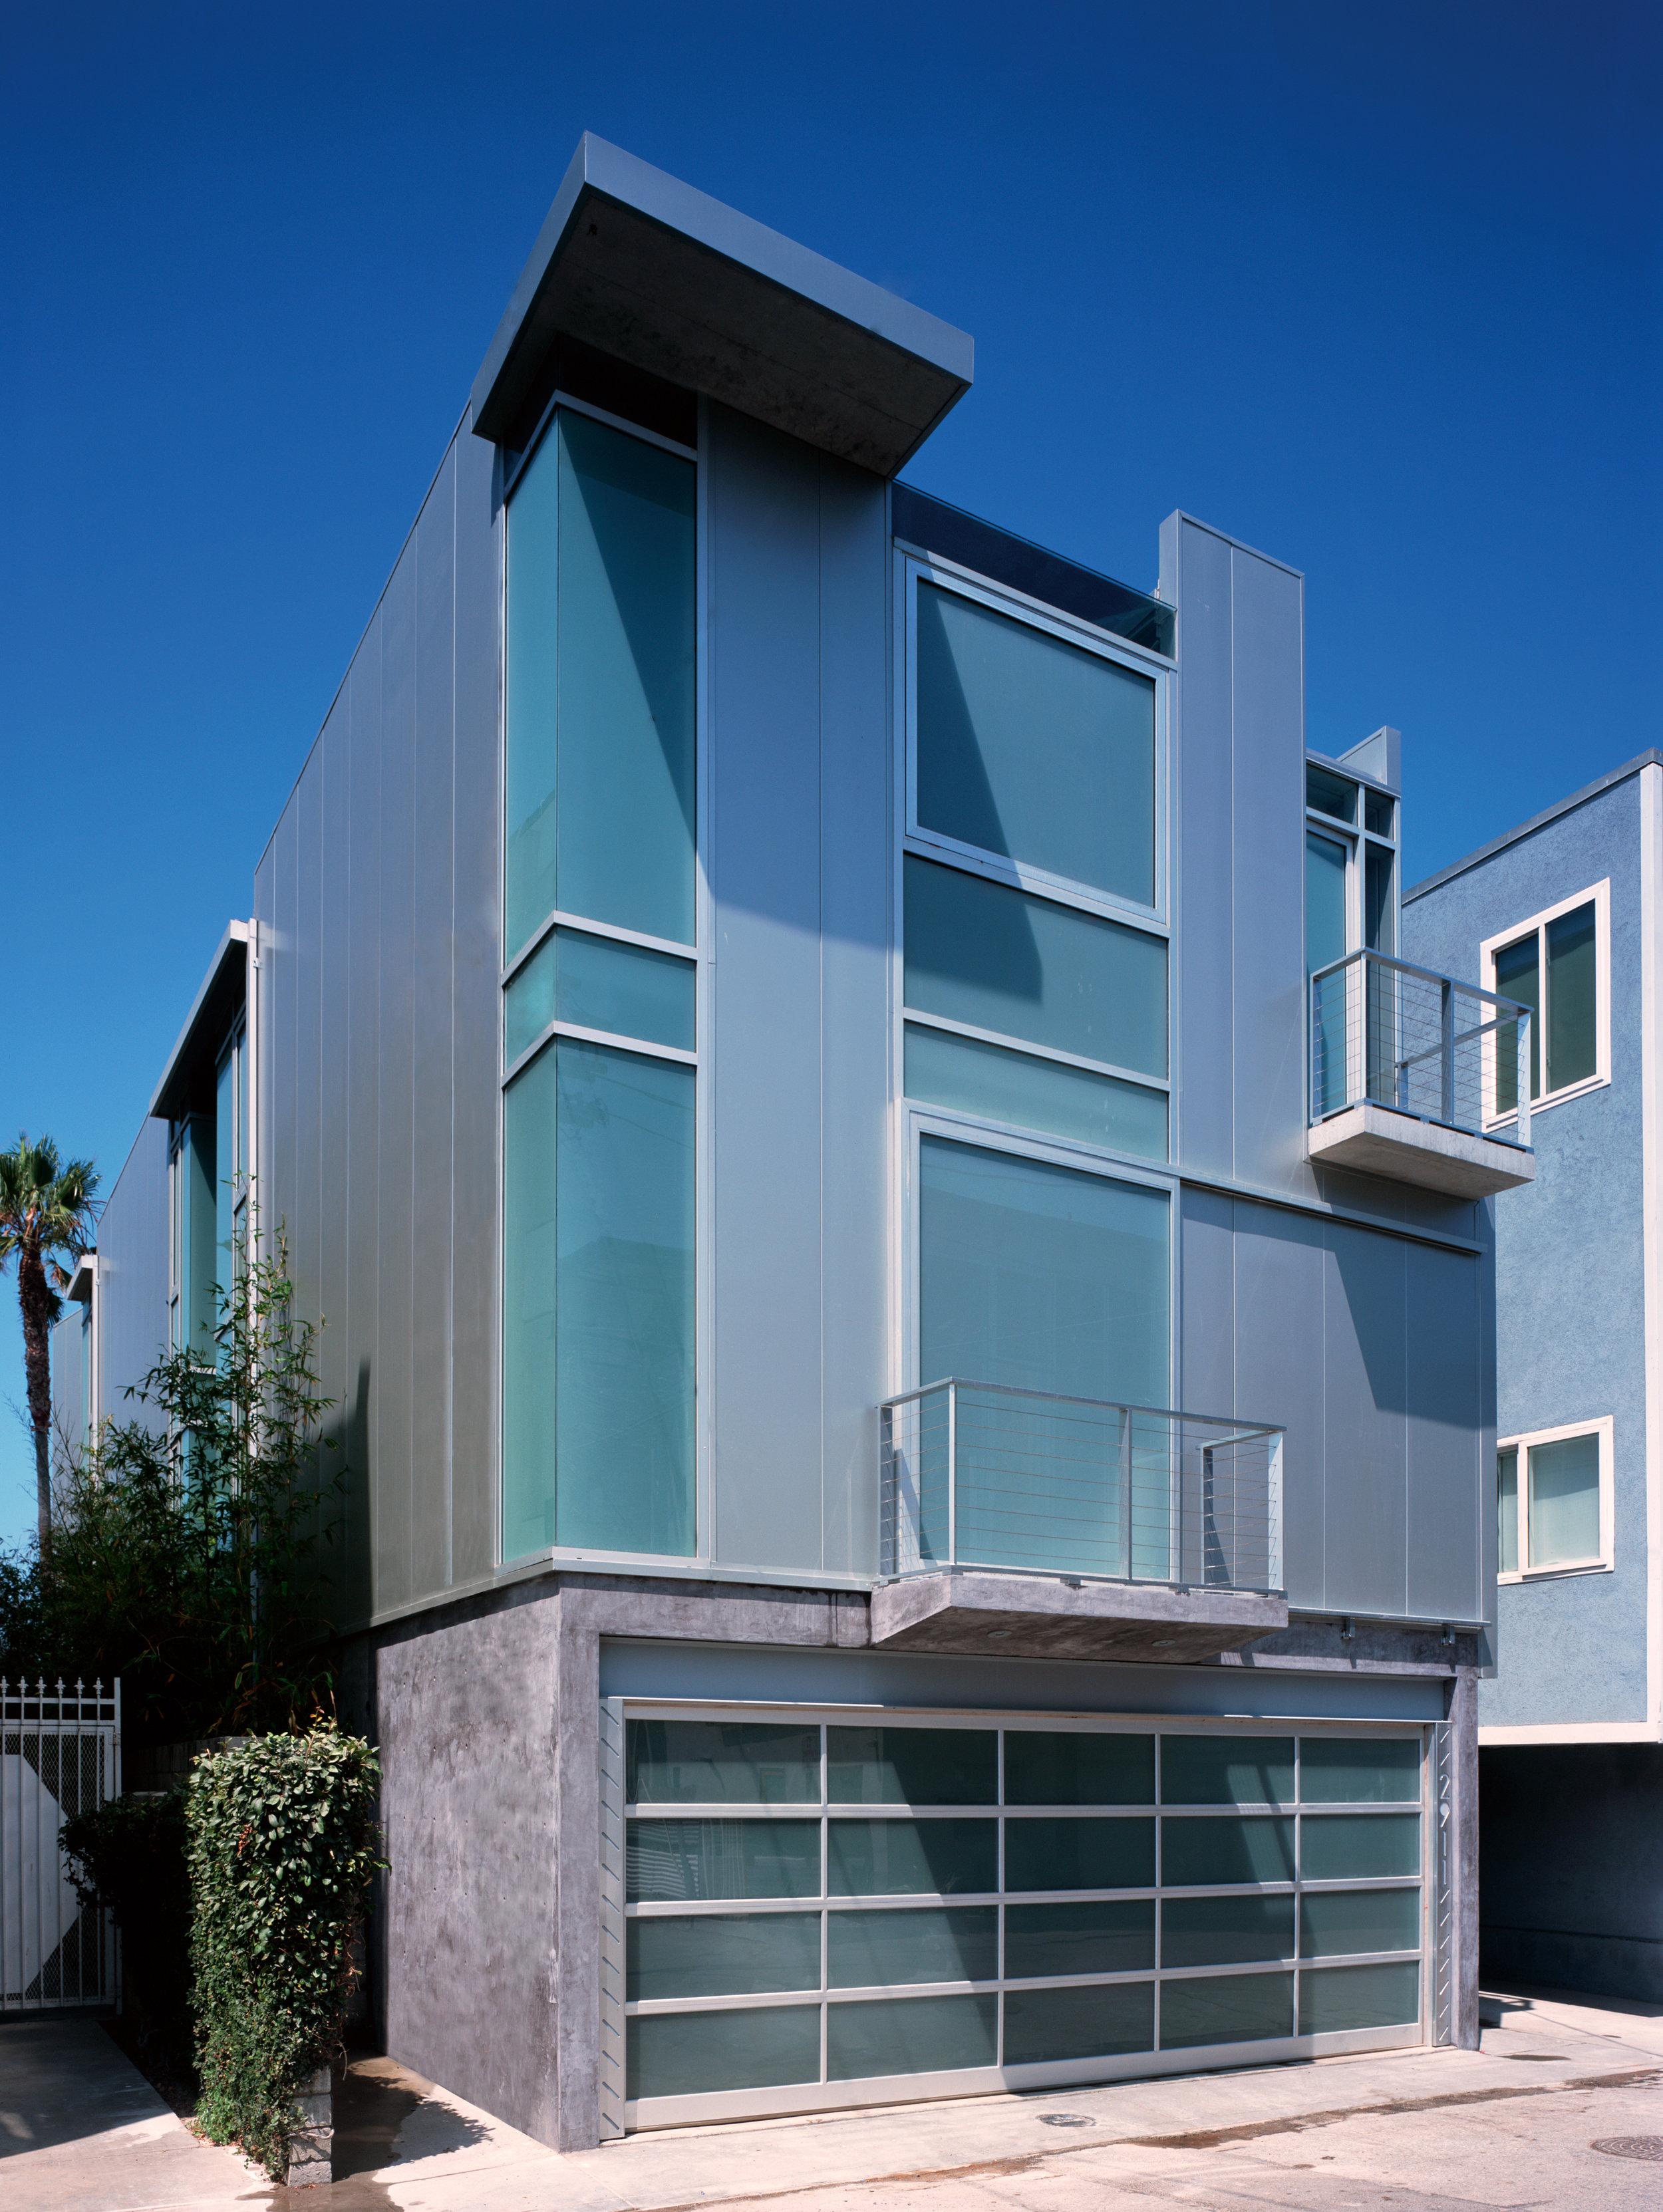 S.E.A.-Studio-Environmental-Architecture-David-Hertz-FAIA-Panel-House-Venice-Beach-California-sustainable-regenerative-restorative-green-design-prefabricated-aluminum-refrigeration-open-concept-ocean-view-residential-glass-steel-sunset-exterior-2.jpg